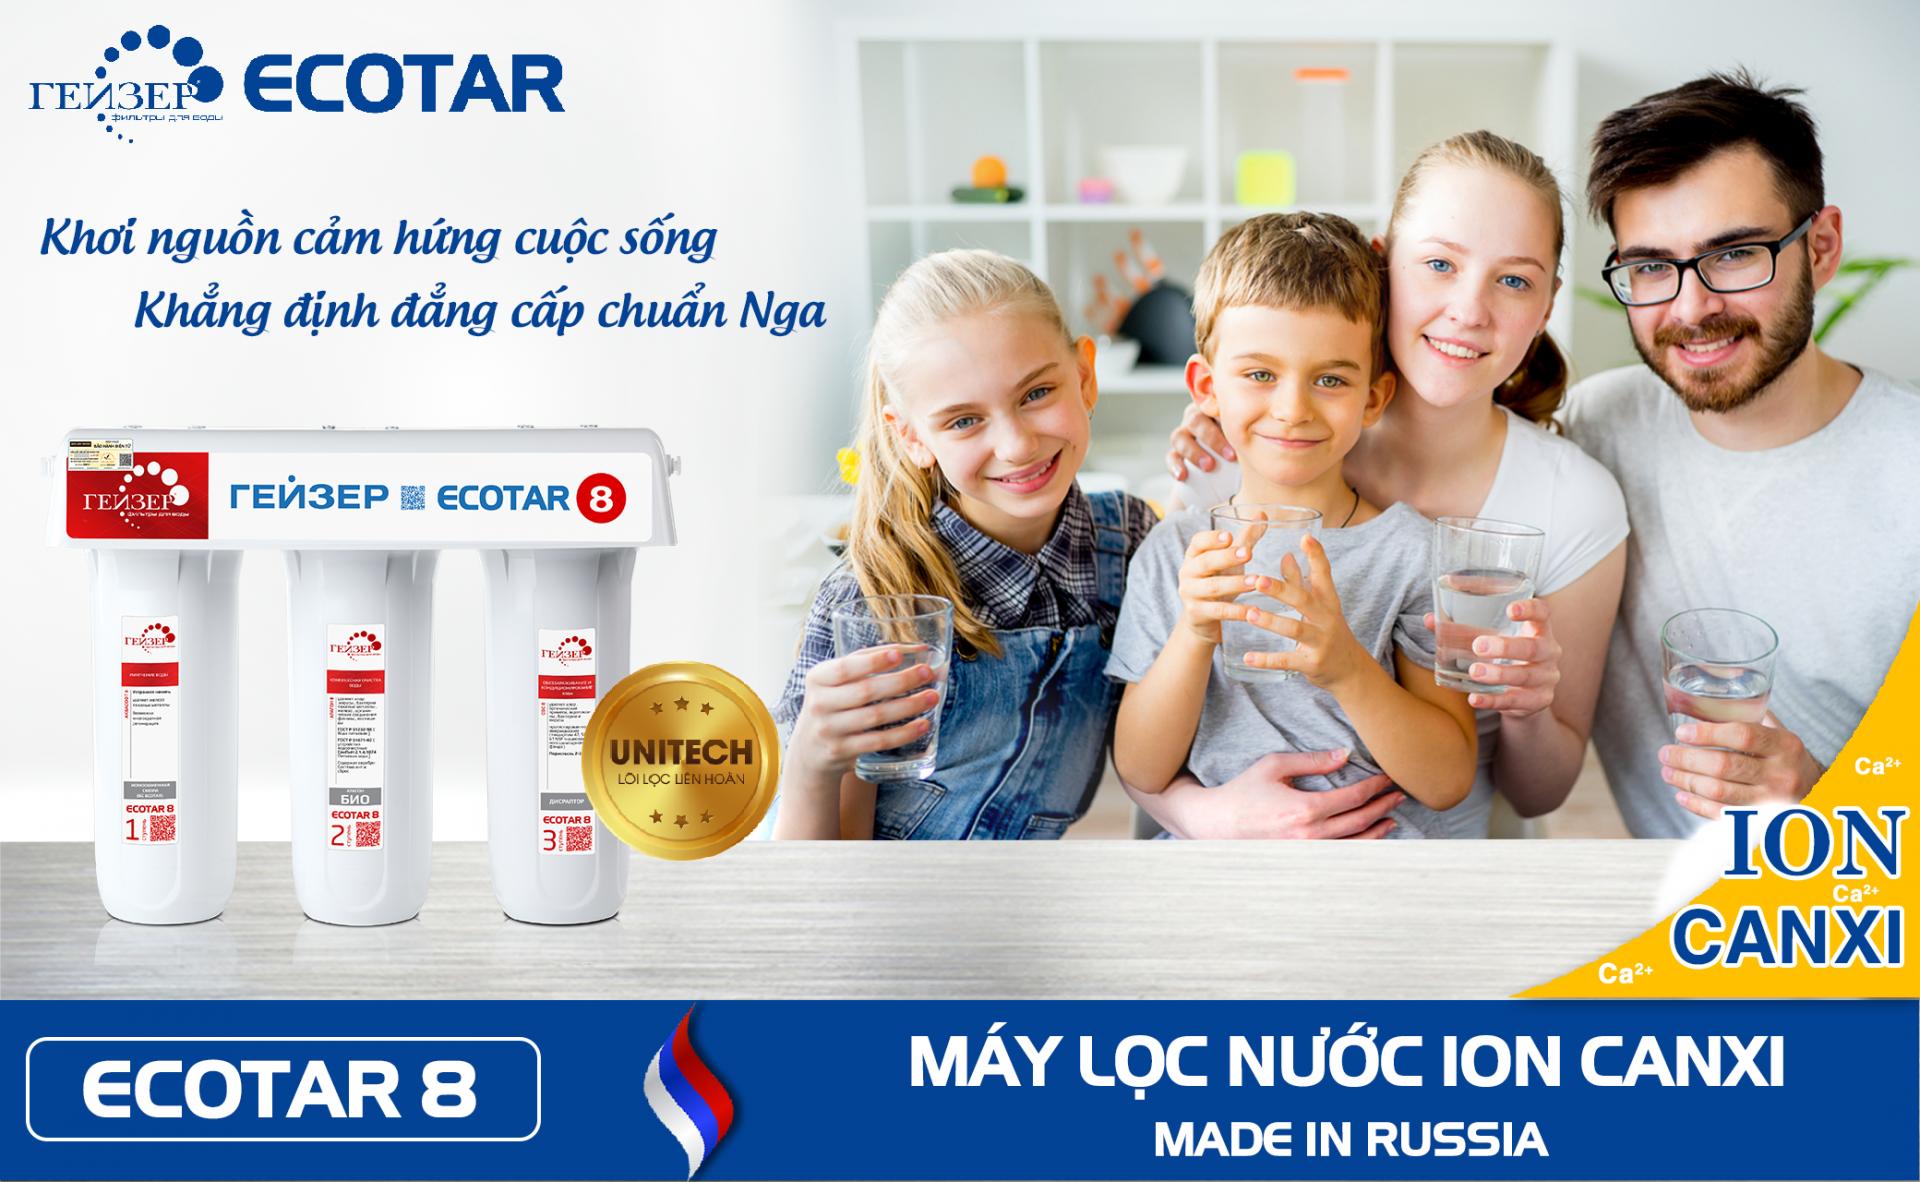 May Loc Nuoc Geyser Ecotar 8